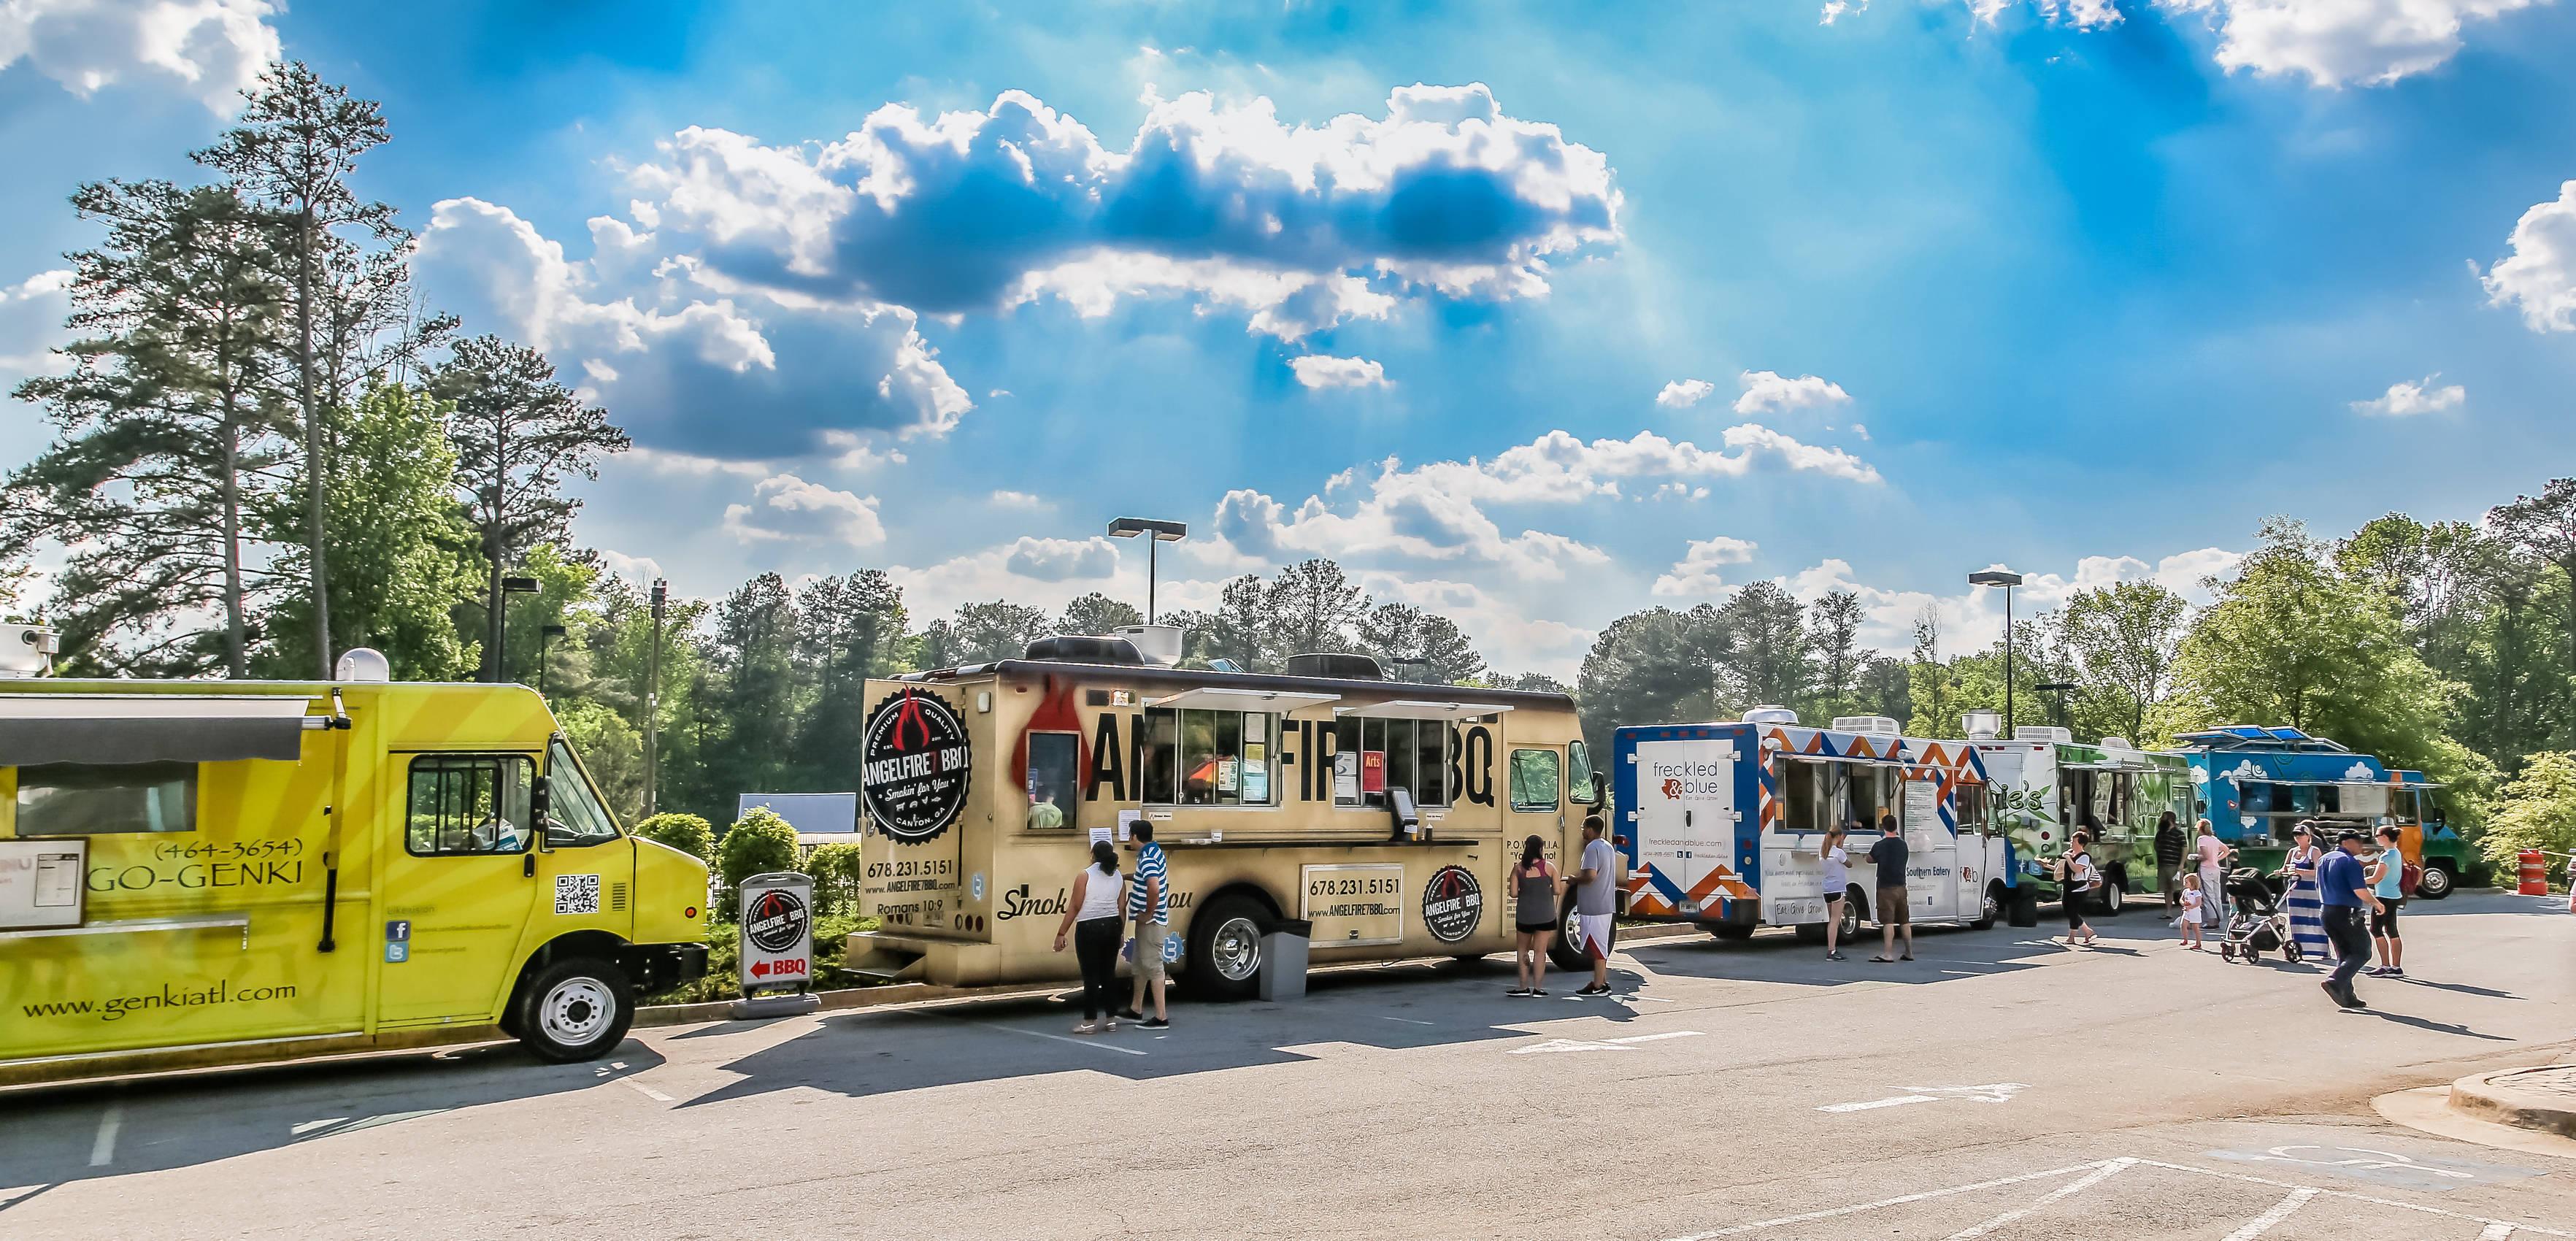 2nd Annual Bayonne Food Truck Festival Set for Saturday